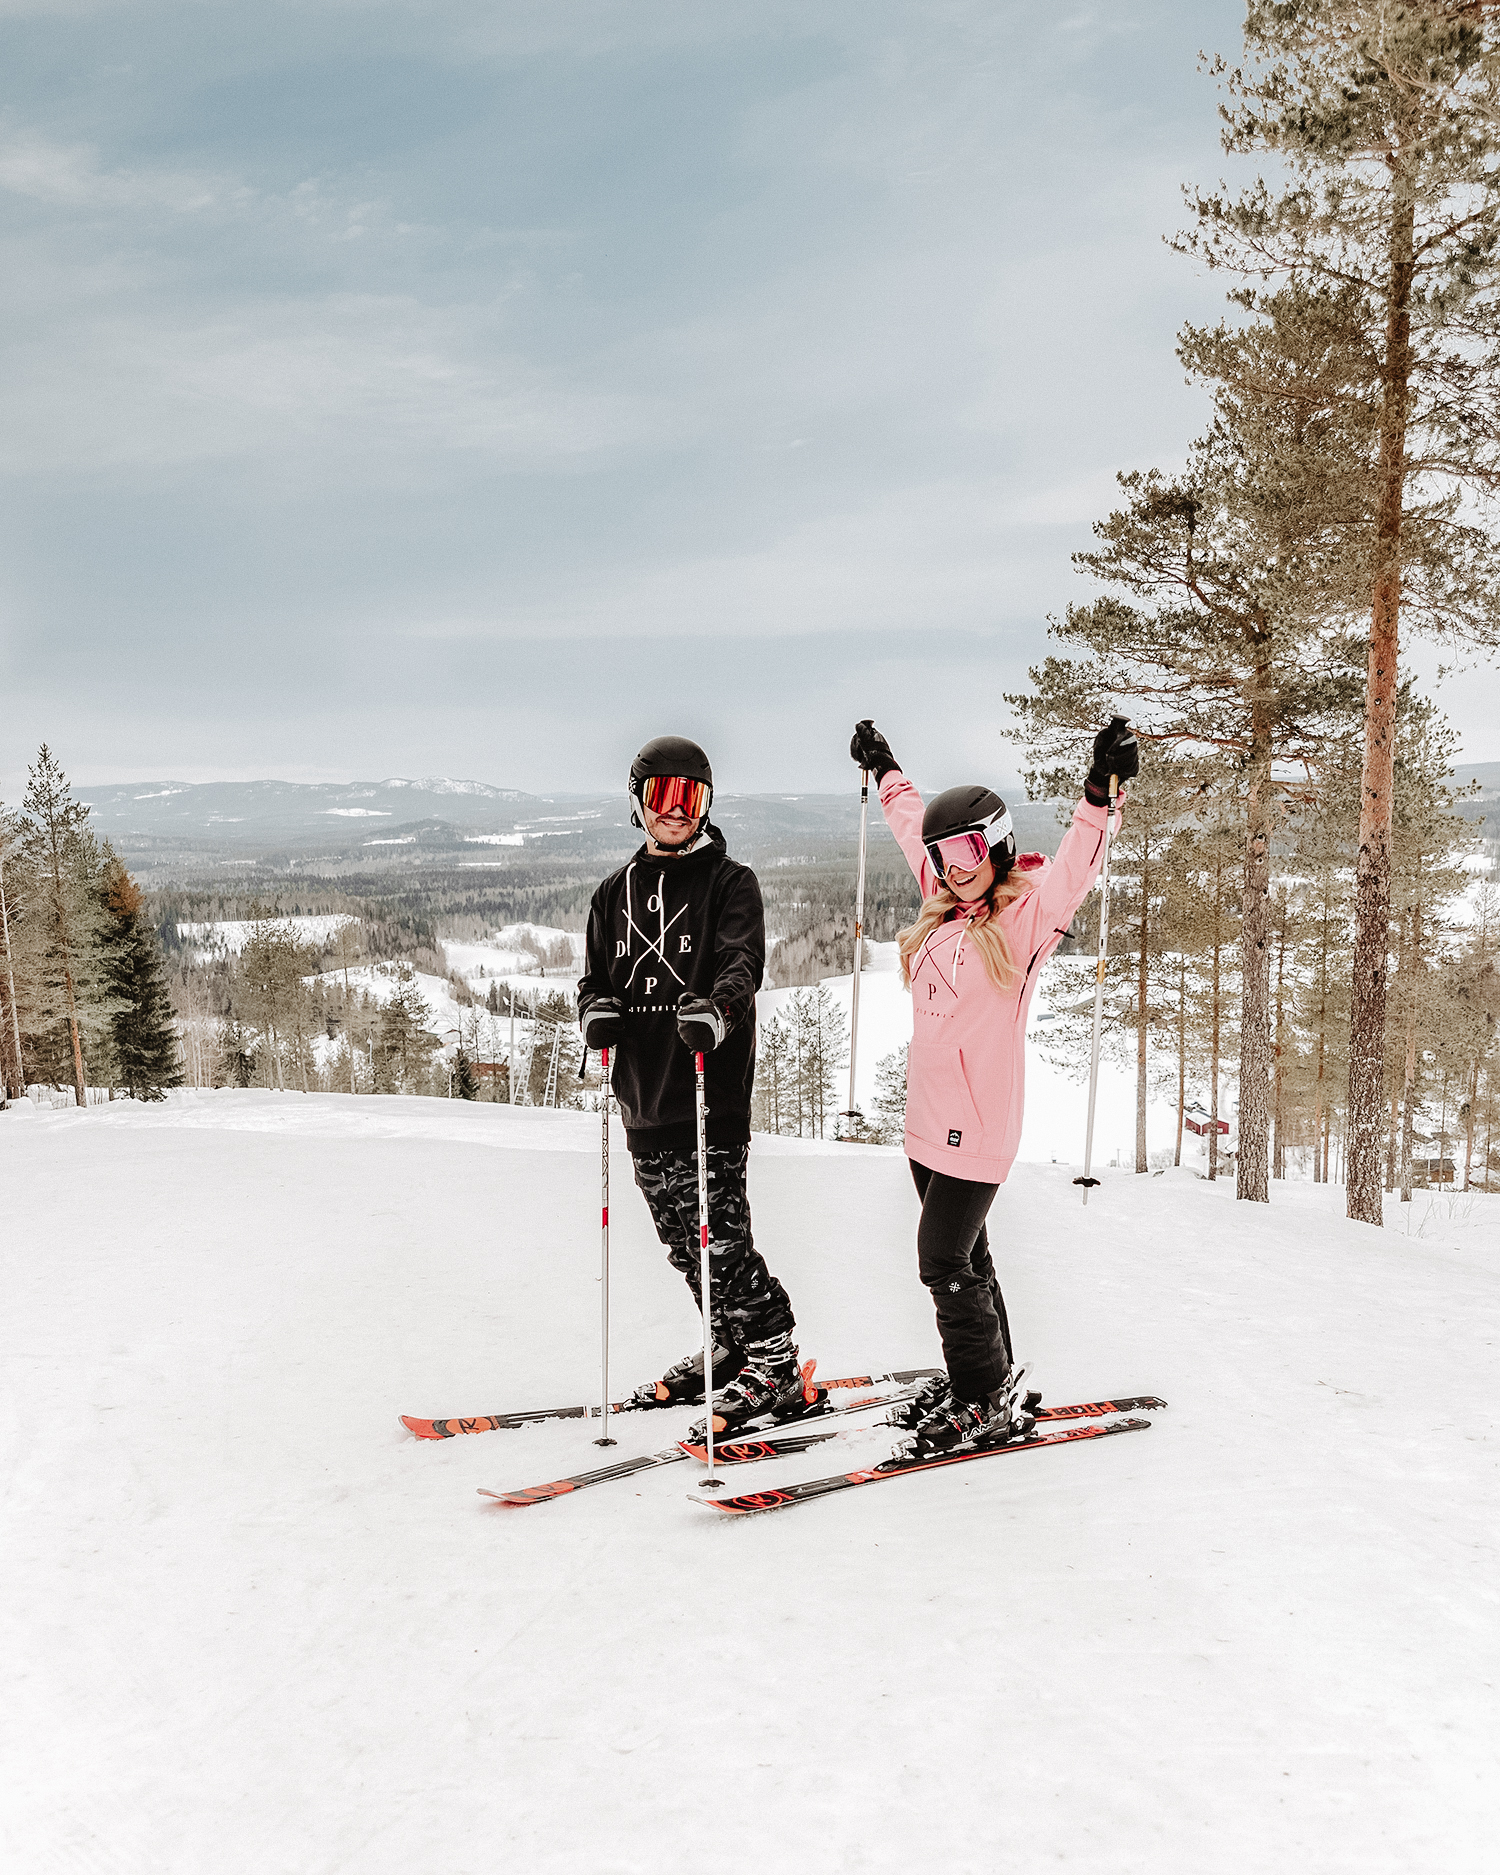 Dope Snowboardjacka & goggles